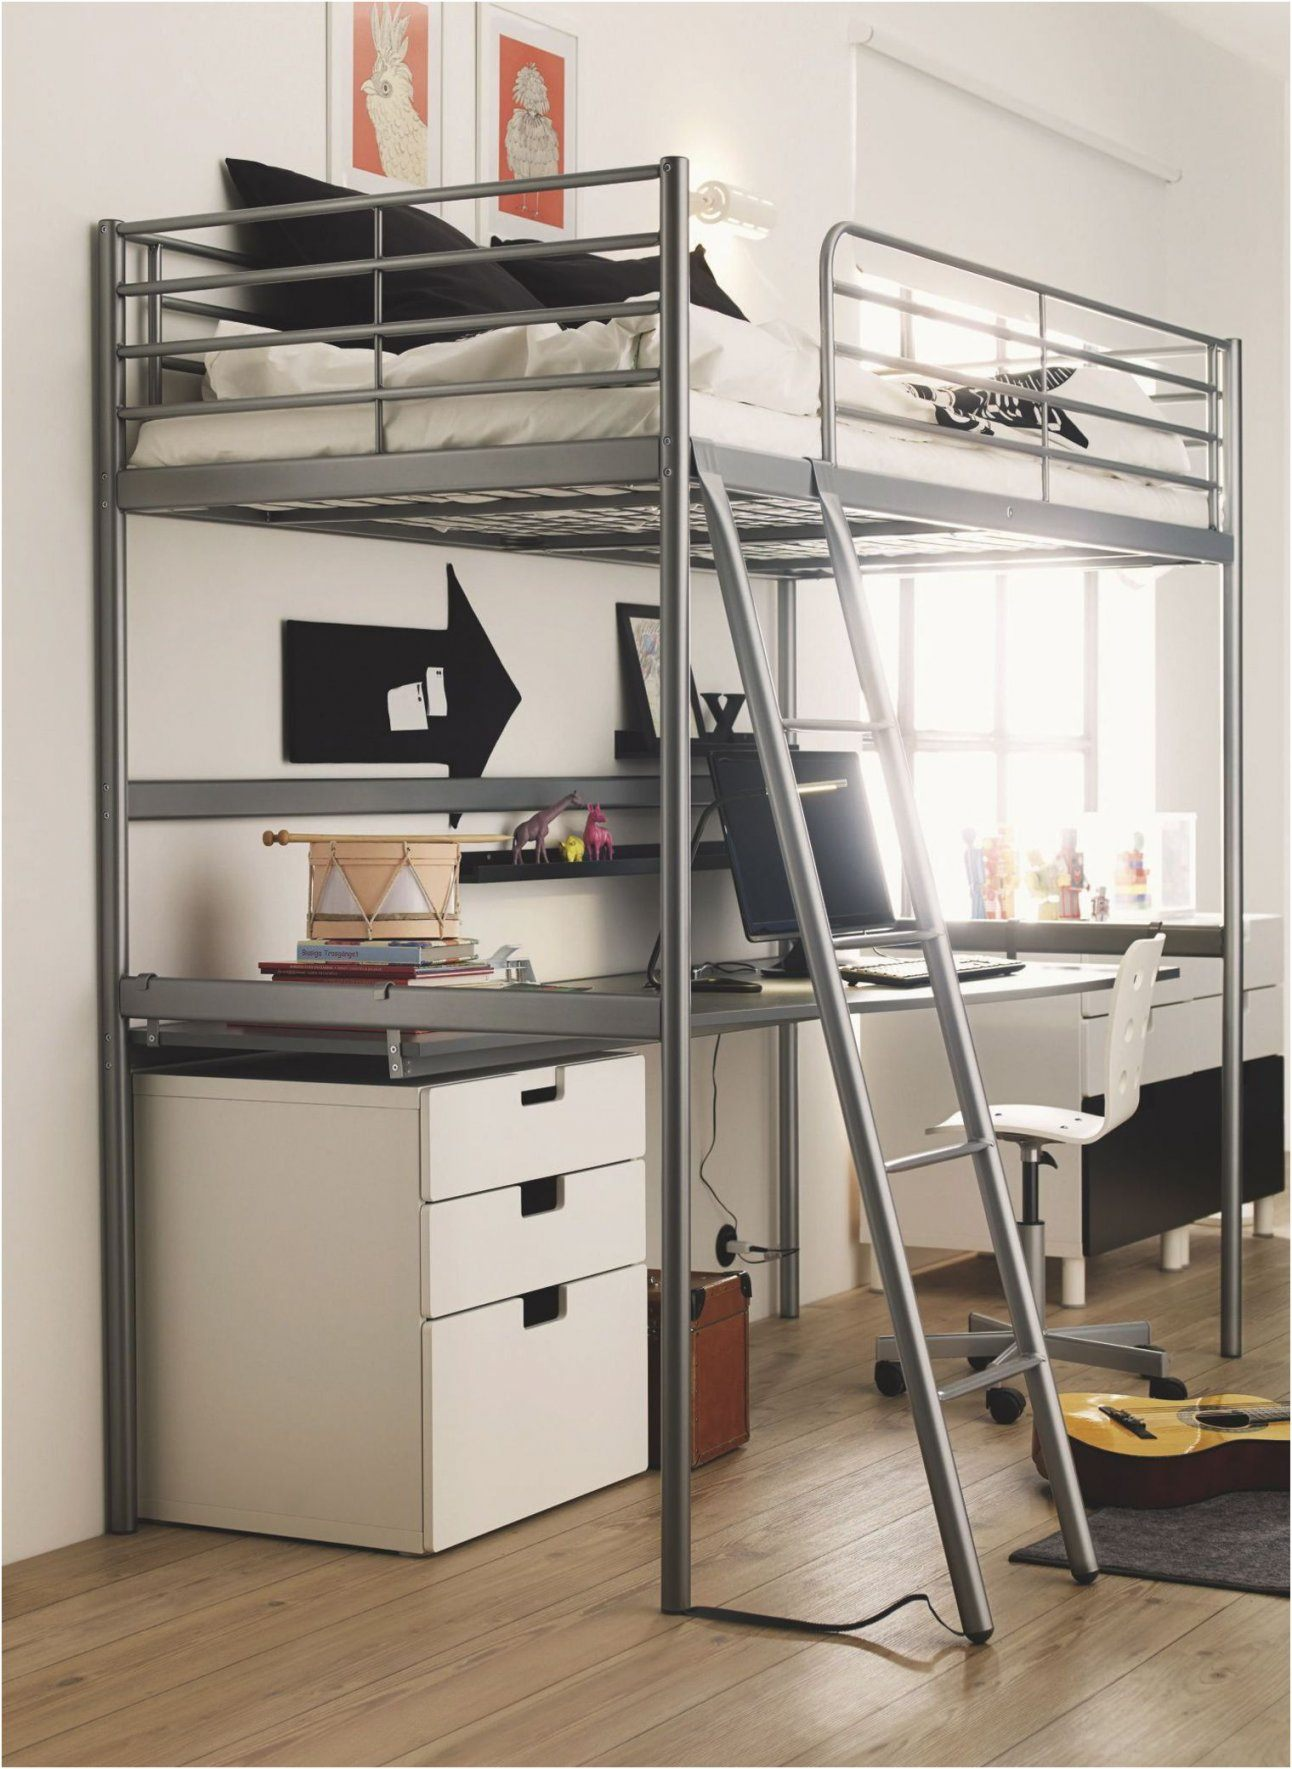 Lit Superposé Ado Frais Lit Mezzanine Avec Bureau Ikea